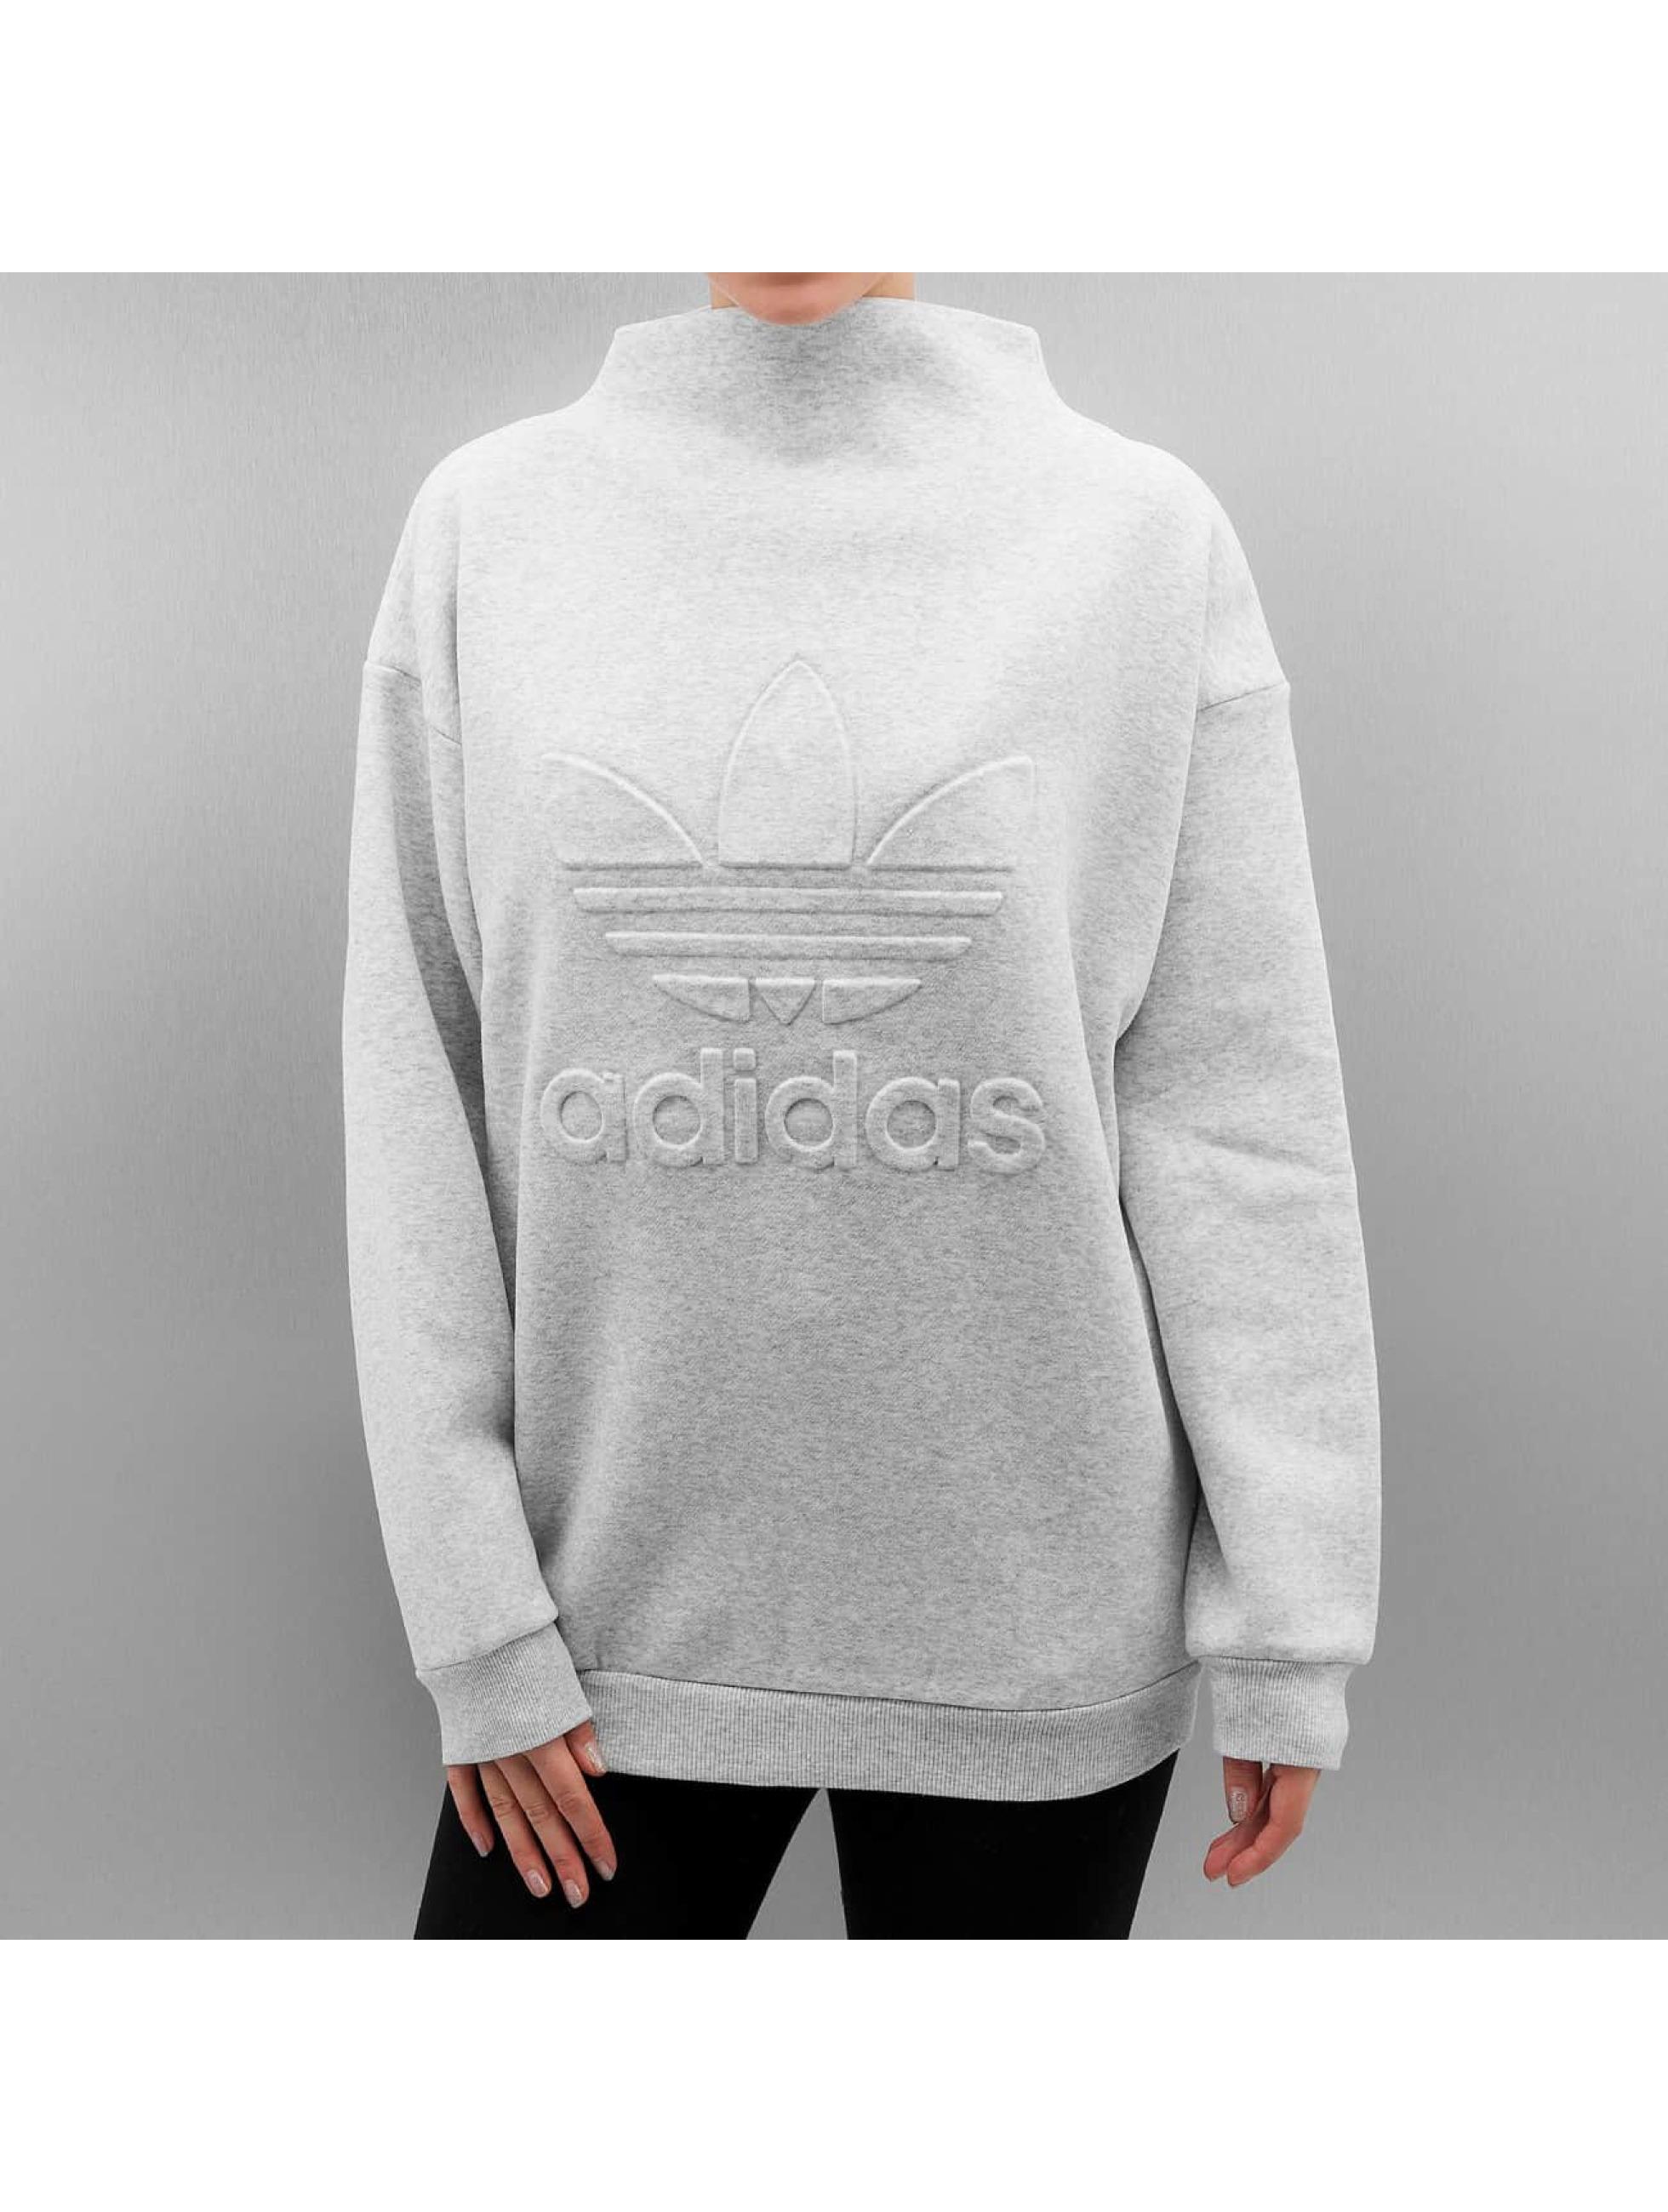 adidas pullover sweatshirt in grau 302494. Black Bedroom Furniture Sets. Home Design Ideas